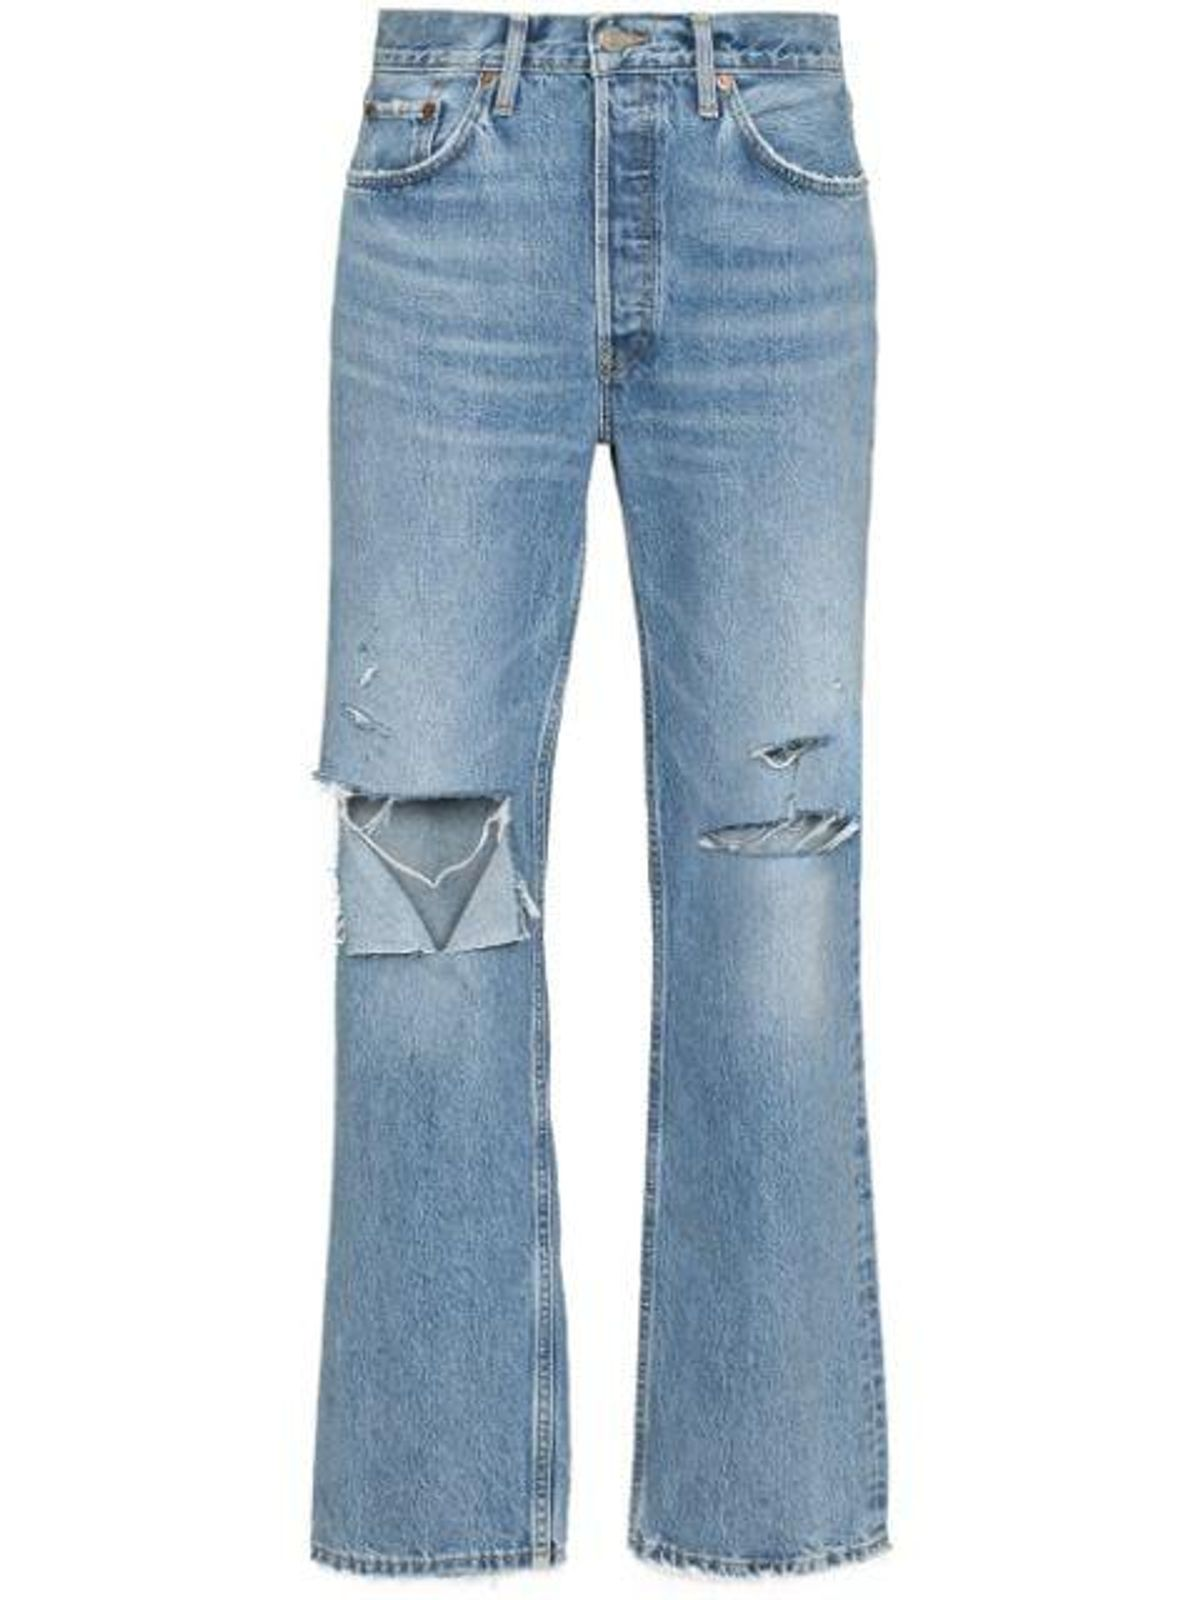 '90s Straight Leg Jeans